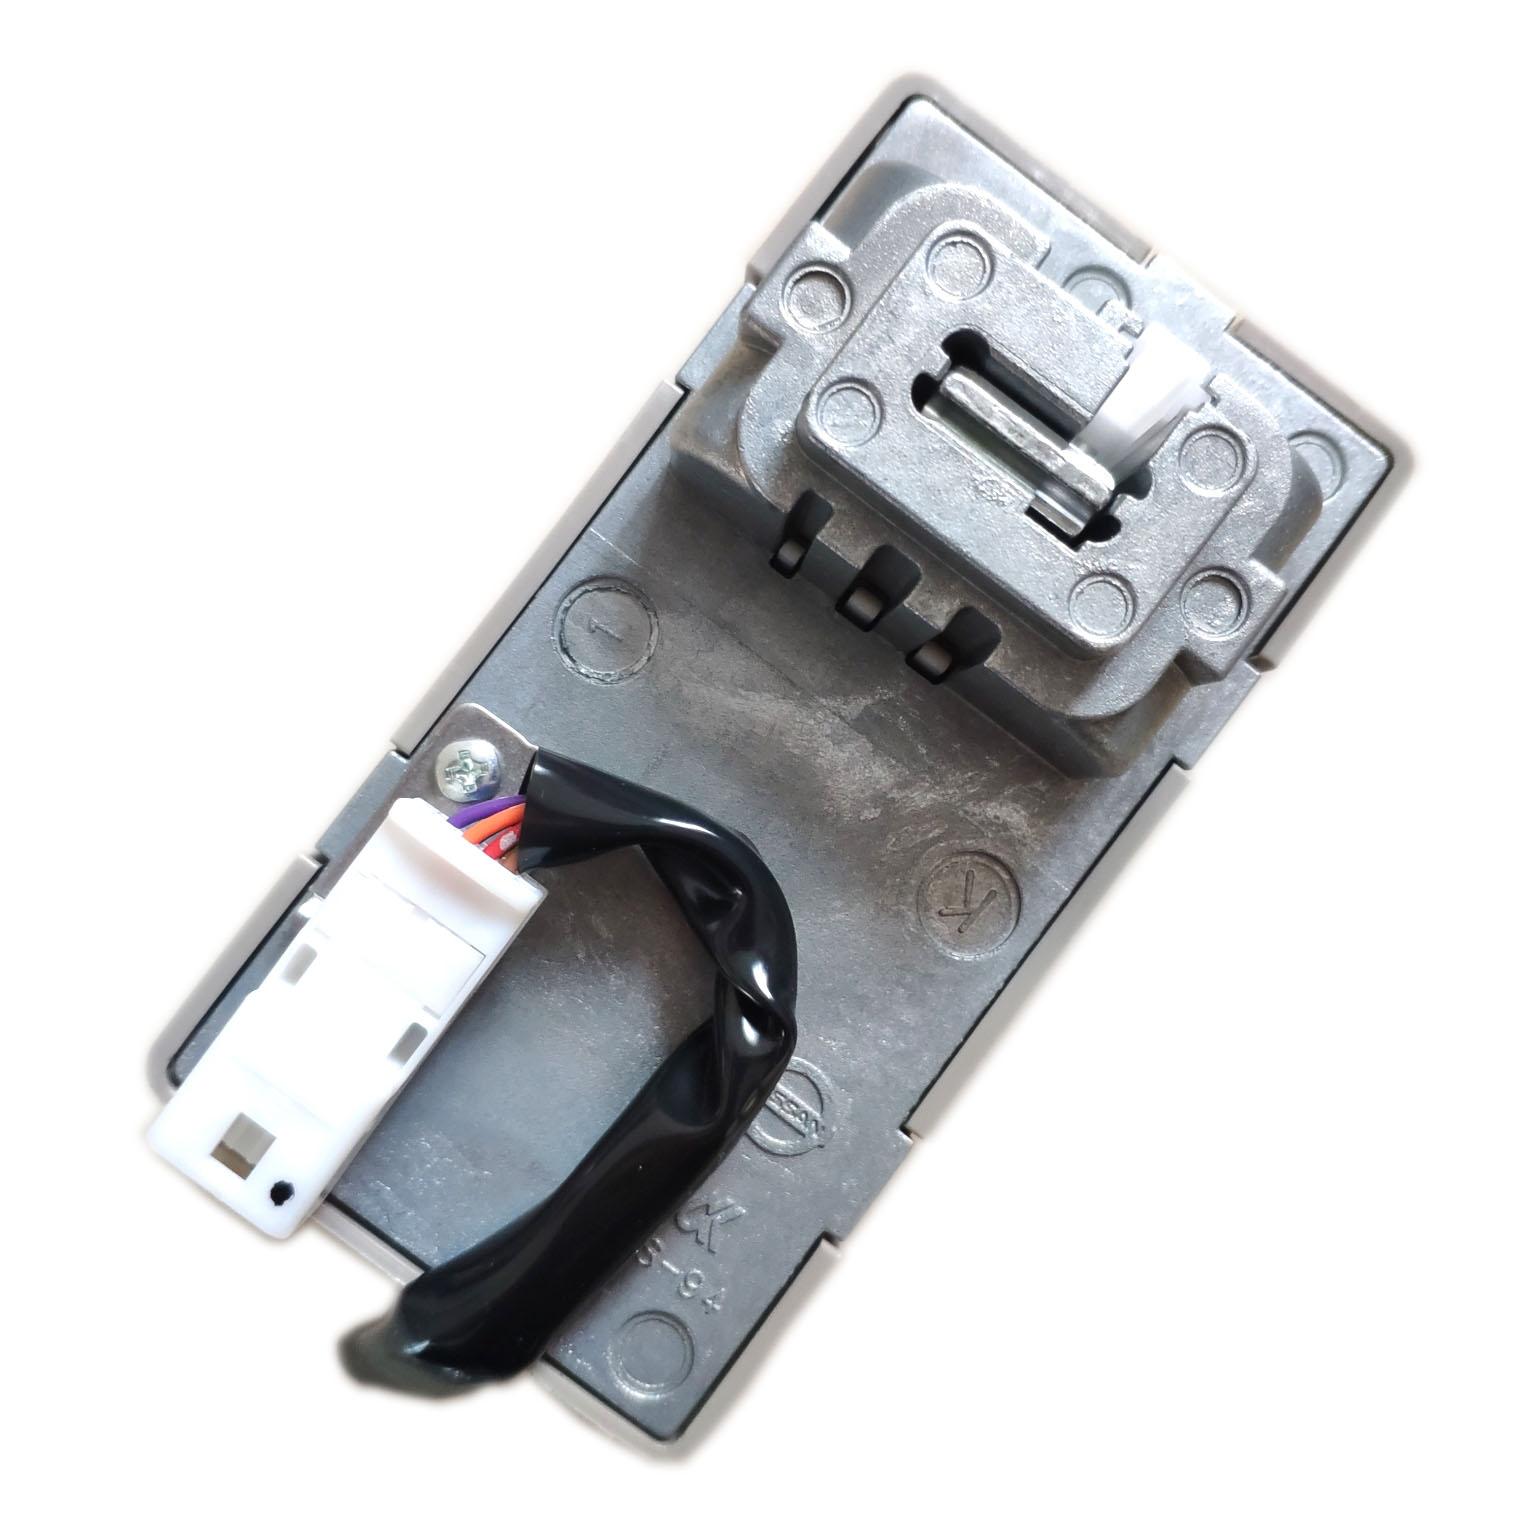 Original  steering wheel lock assembly for Nissan Teana 2013 - 2016